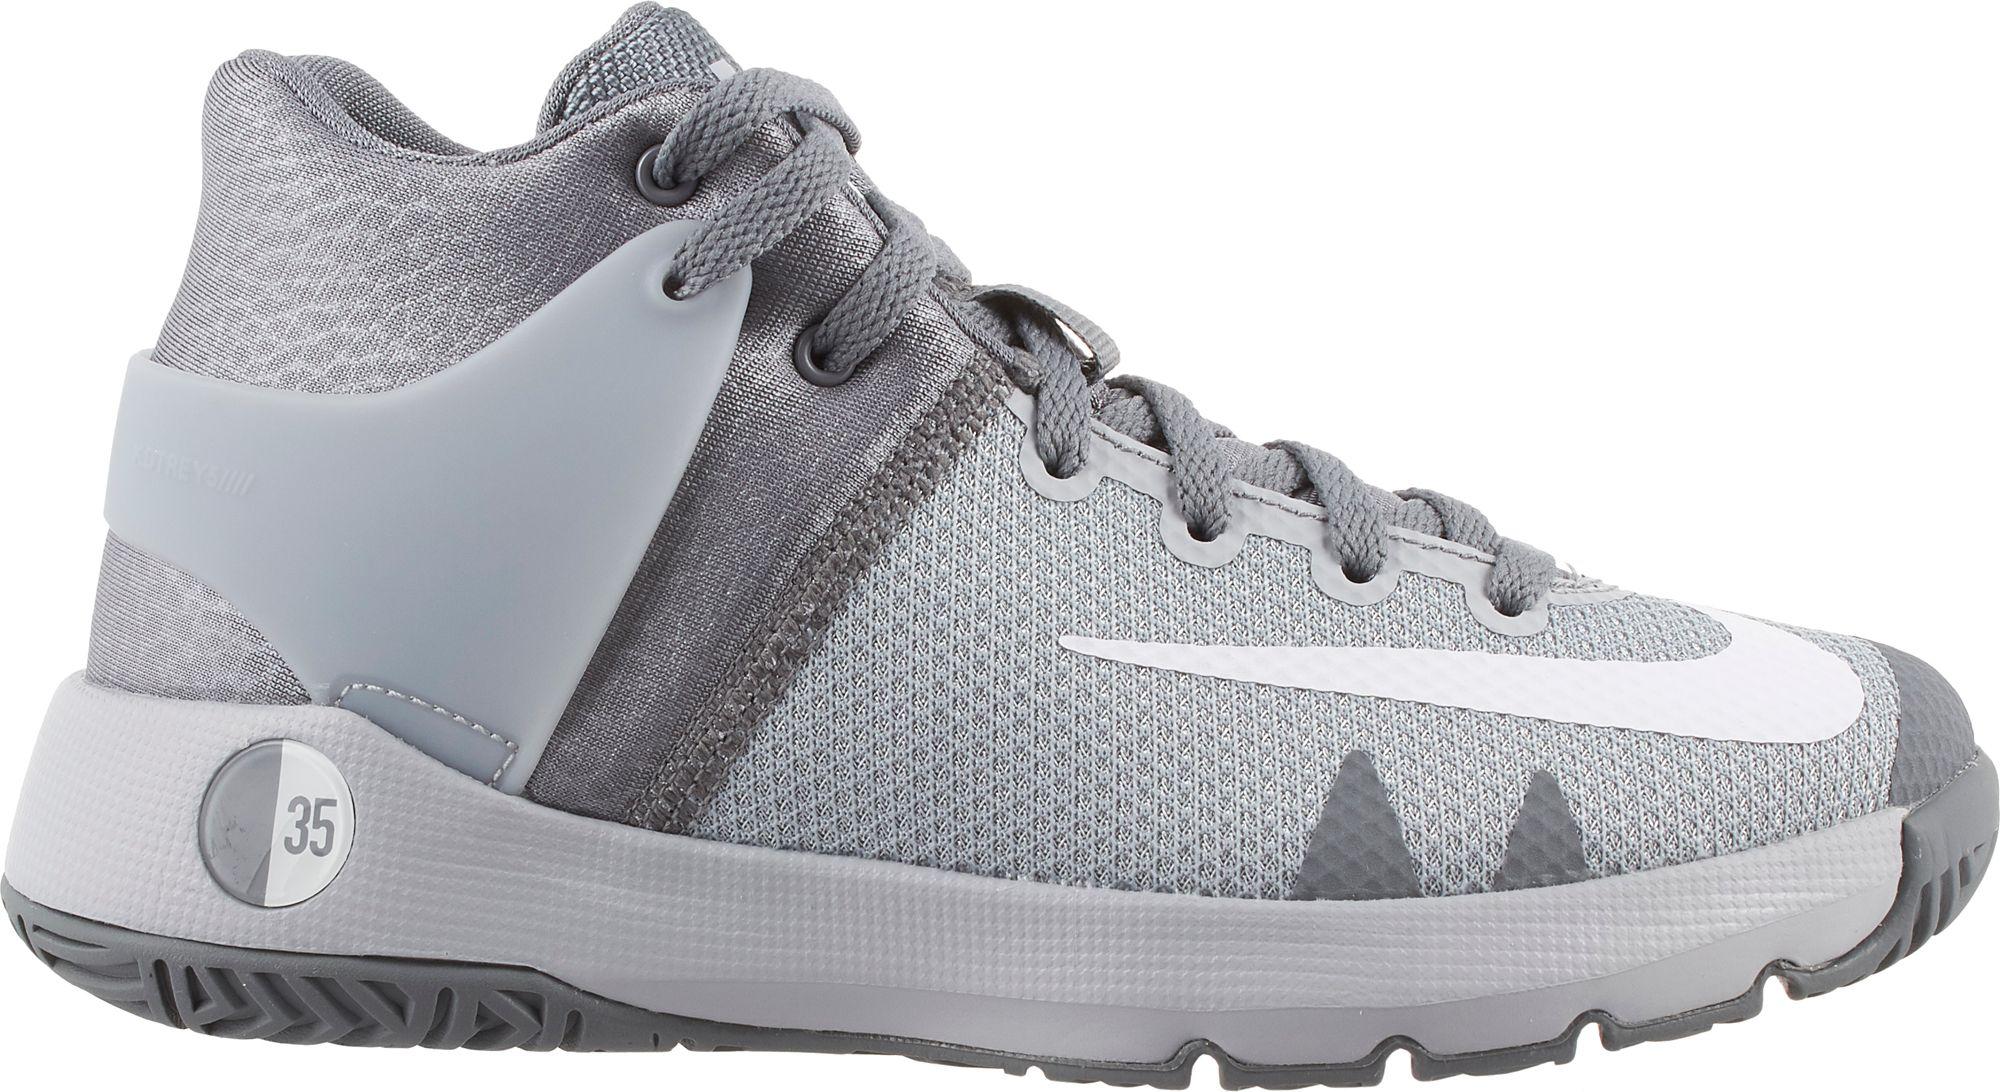 kd 6 shoes size 5